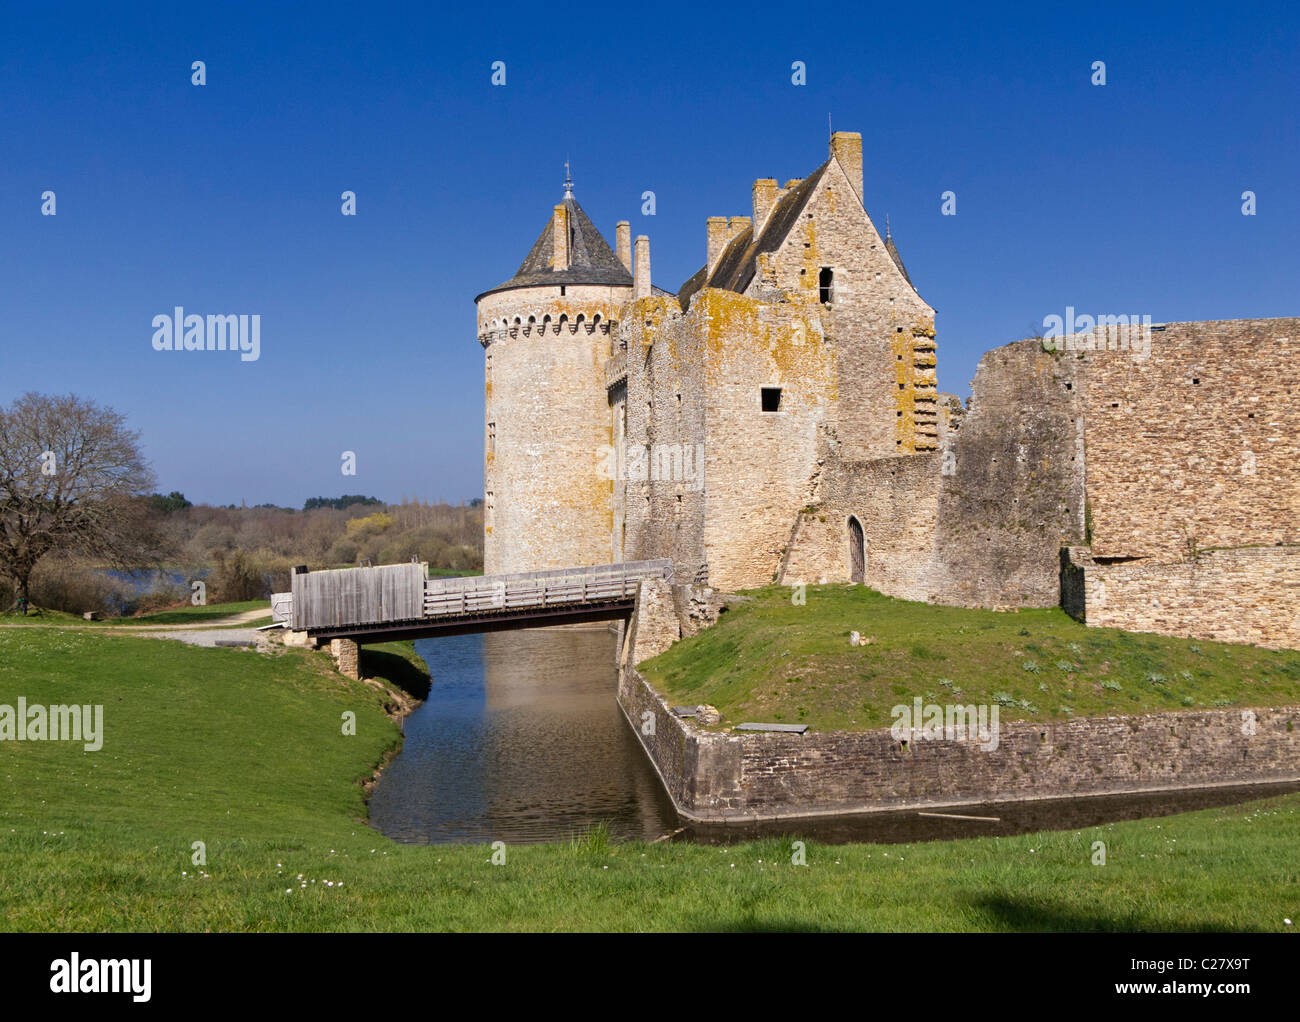 Chateau de Suscinio, Presqu'ile de Rhuys; Morbihan, Brittany, France, Europe - Stock Image